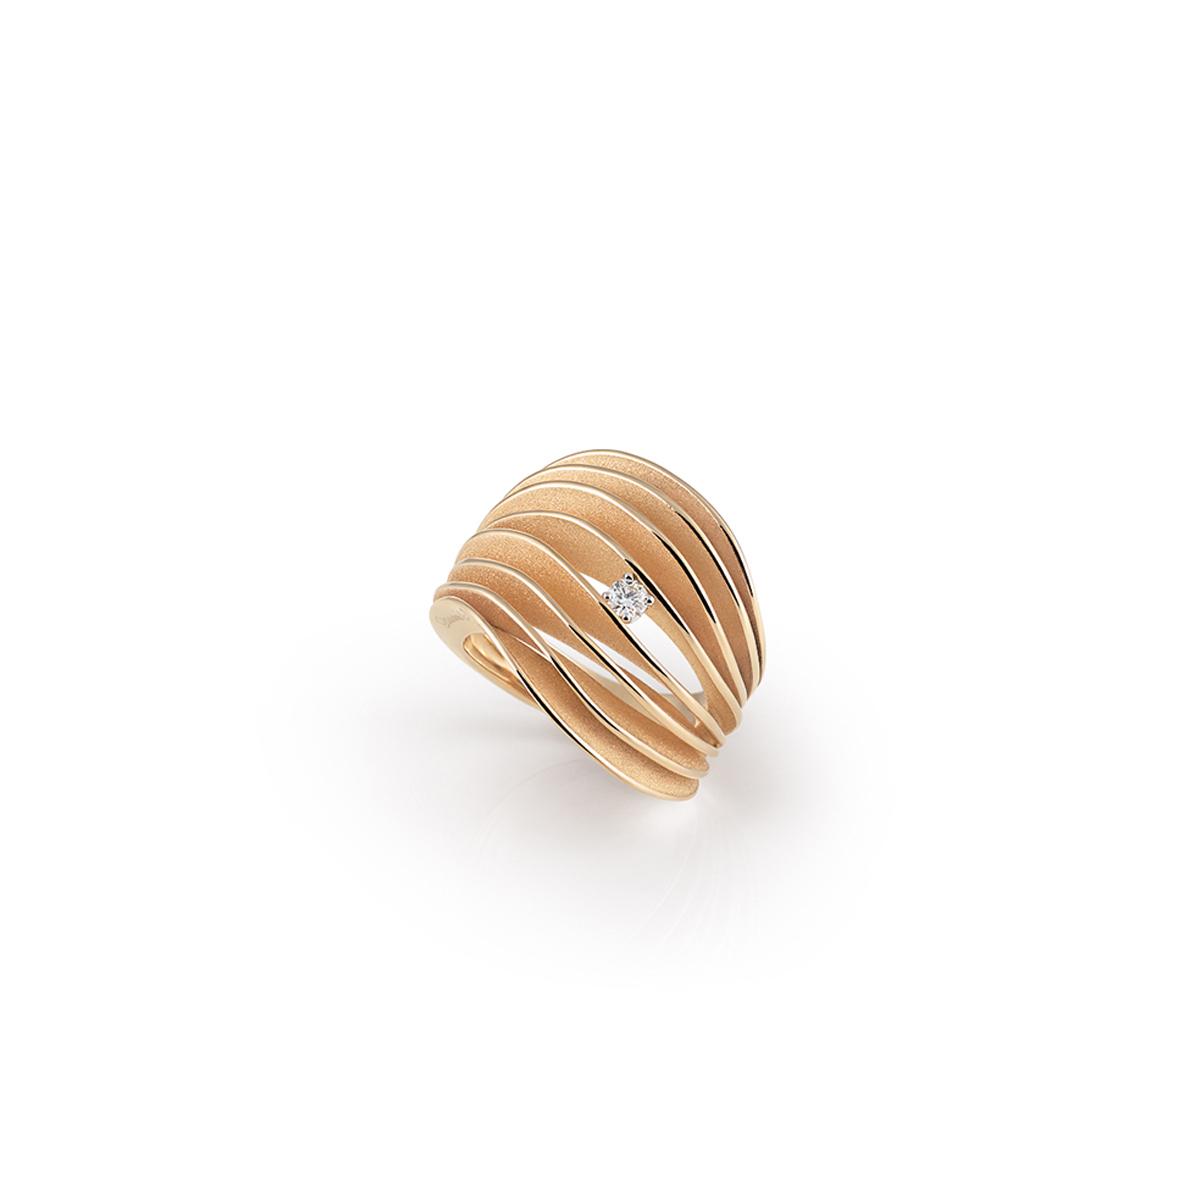 Annamaria Cammilli Dune Ring aus 18 Karat Orange Apricot Gold mit Brillant